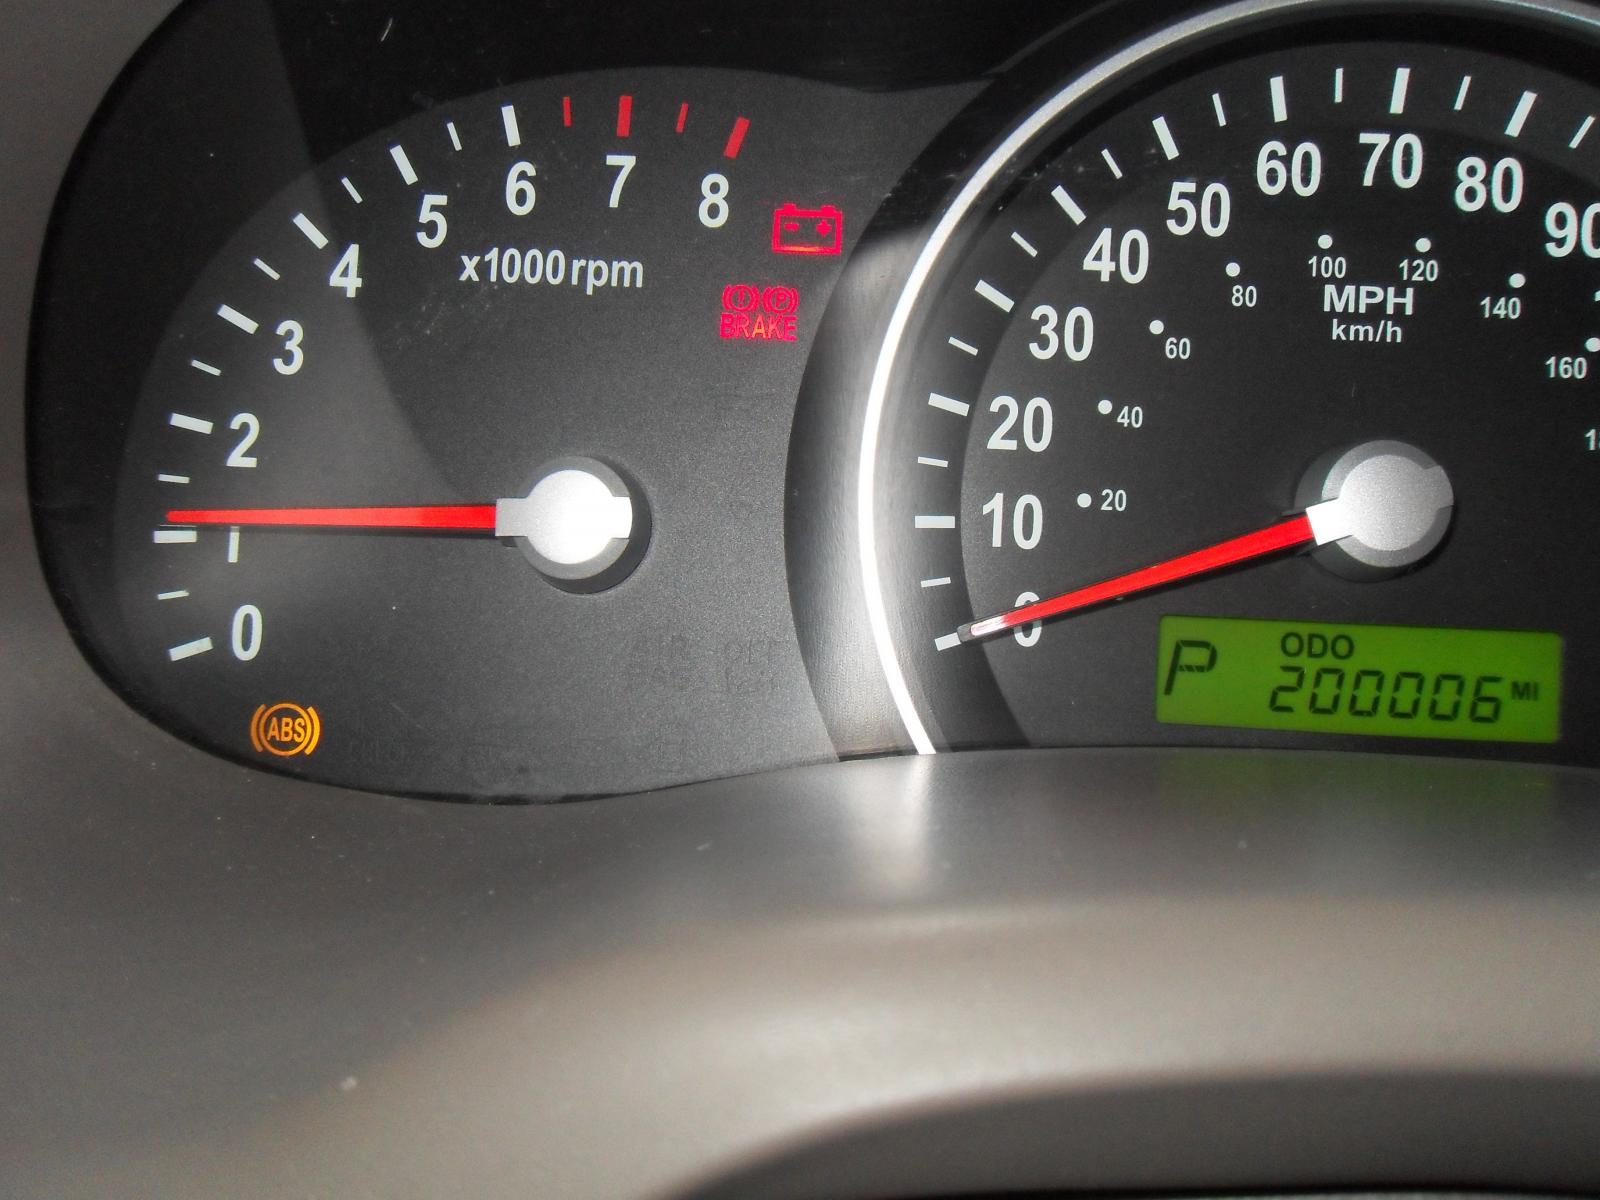 Kia Forte Lx >> HELP! Lights on all over the gauge cluster! - Kia Forum